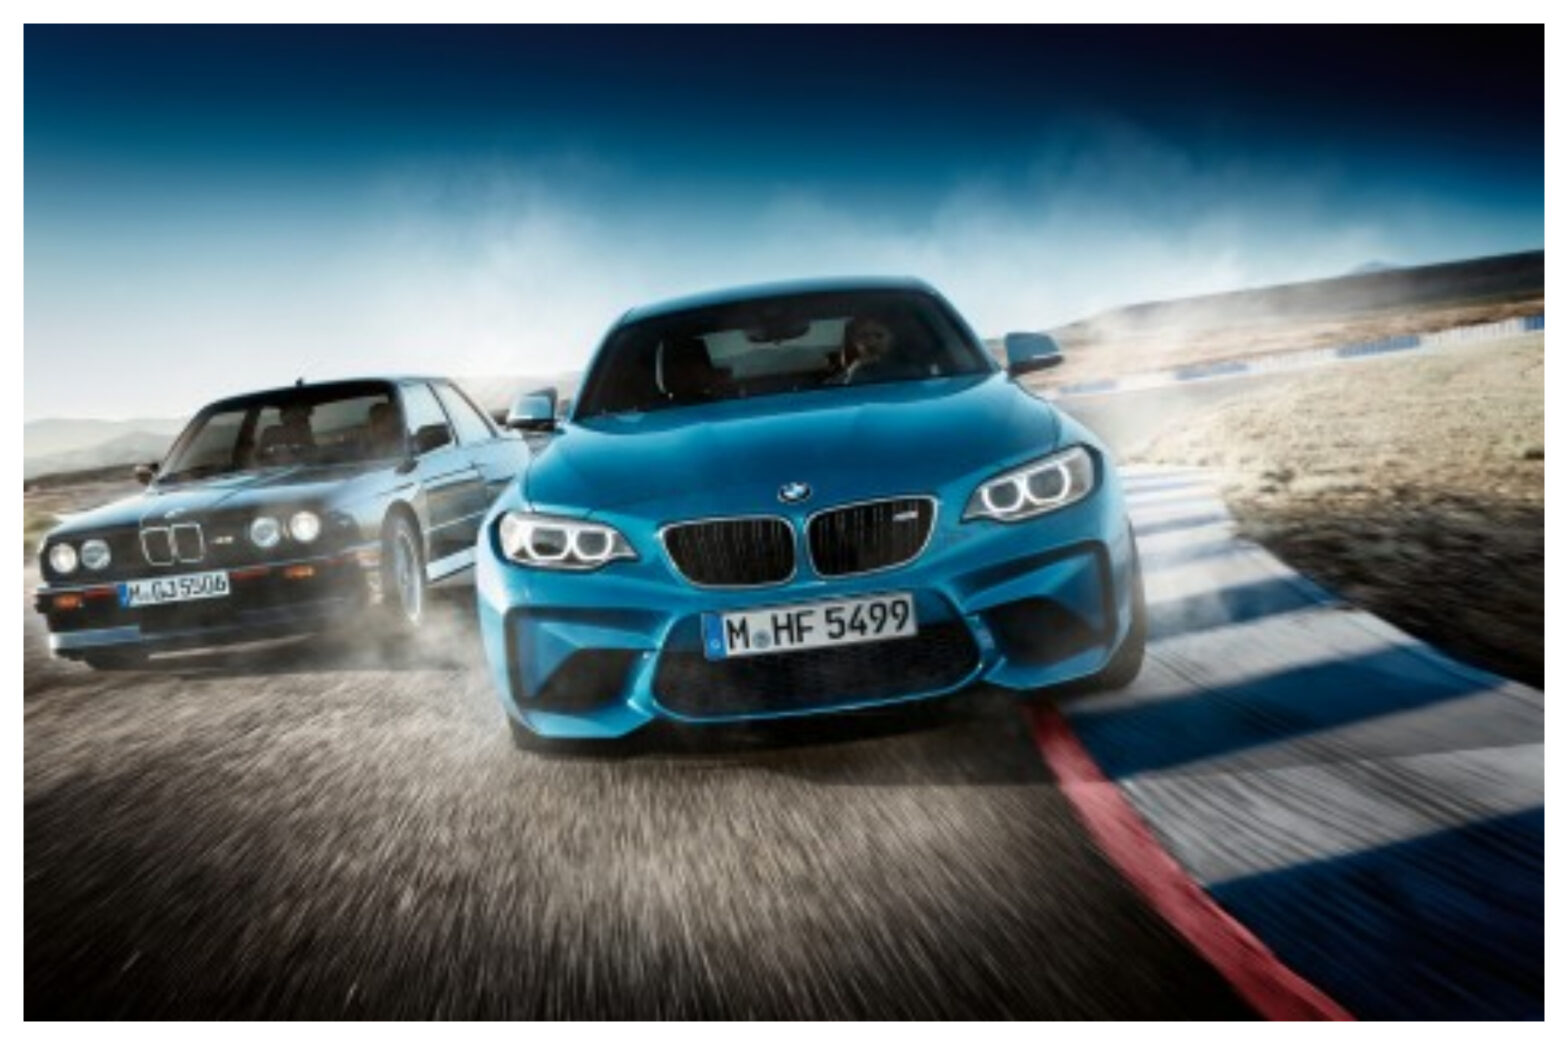 BMW中古|ボディタイプ別人気おすすめランキングと最新中古車価格を紹介